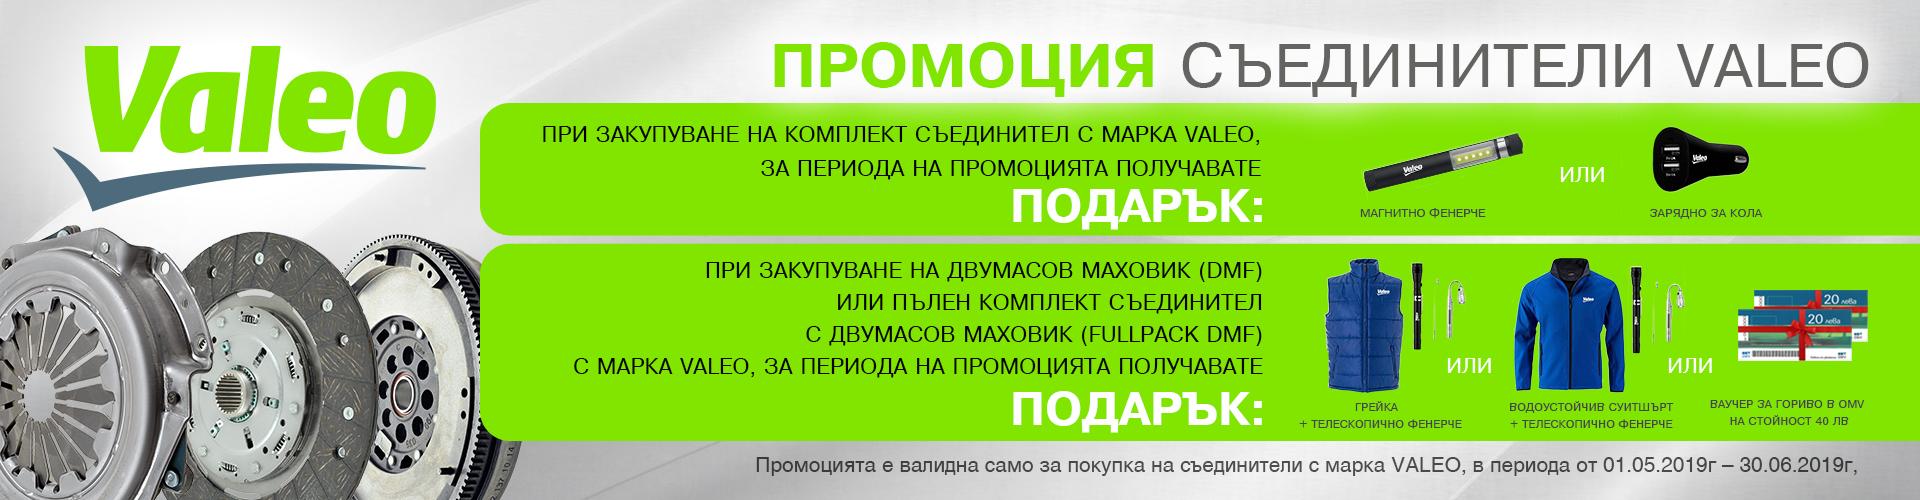 promo_valeo_suedinitel_01052019-30062019_banner.jpg